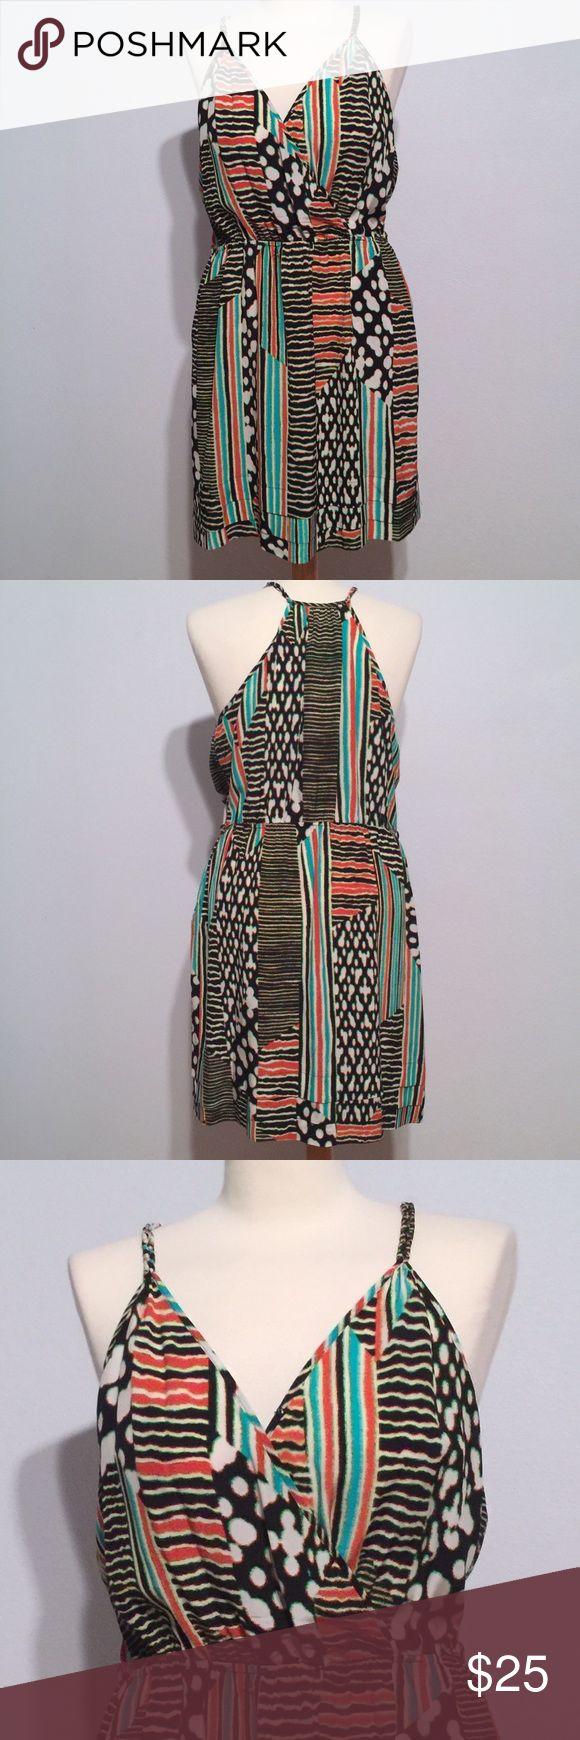 Charlie Jade 100% Silk printed summer dress Super cute summer dress by Charlie Jade! 100% Silk, Size L. Charlie Jade brand purchased at Nordstrom. Nordstrom Dresses